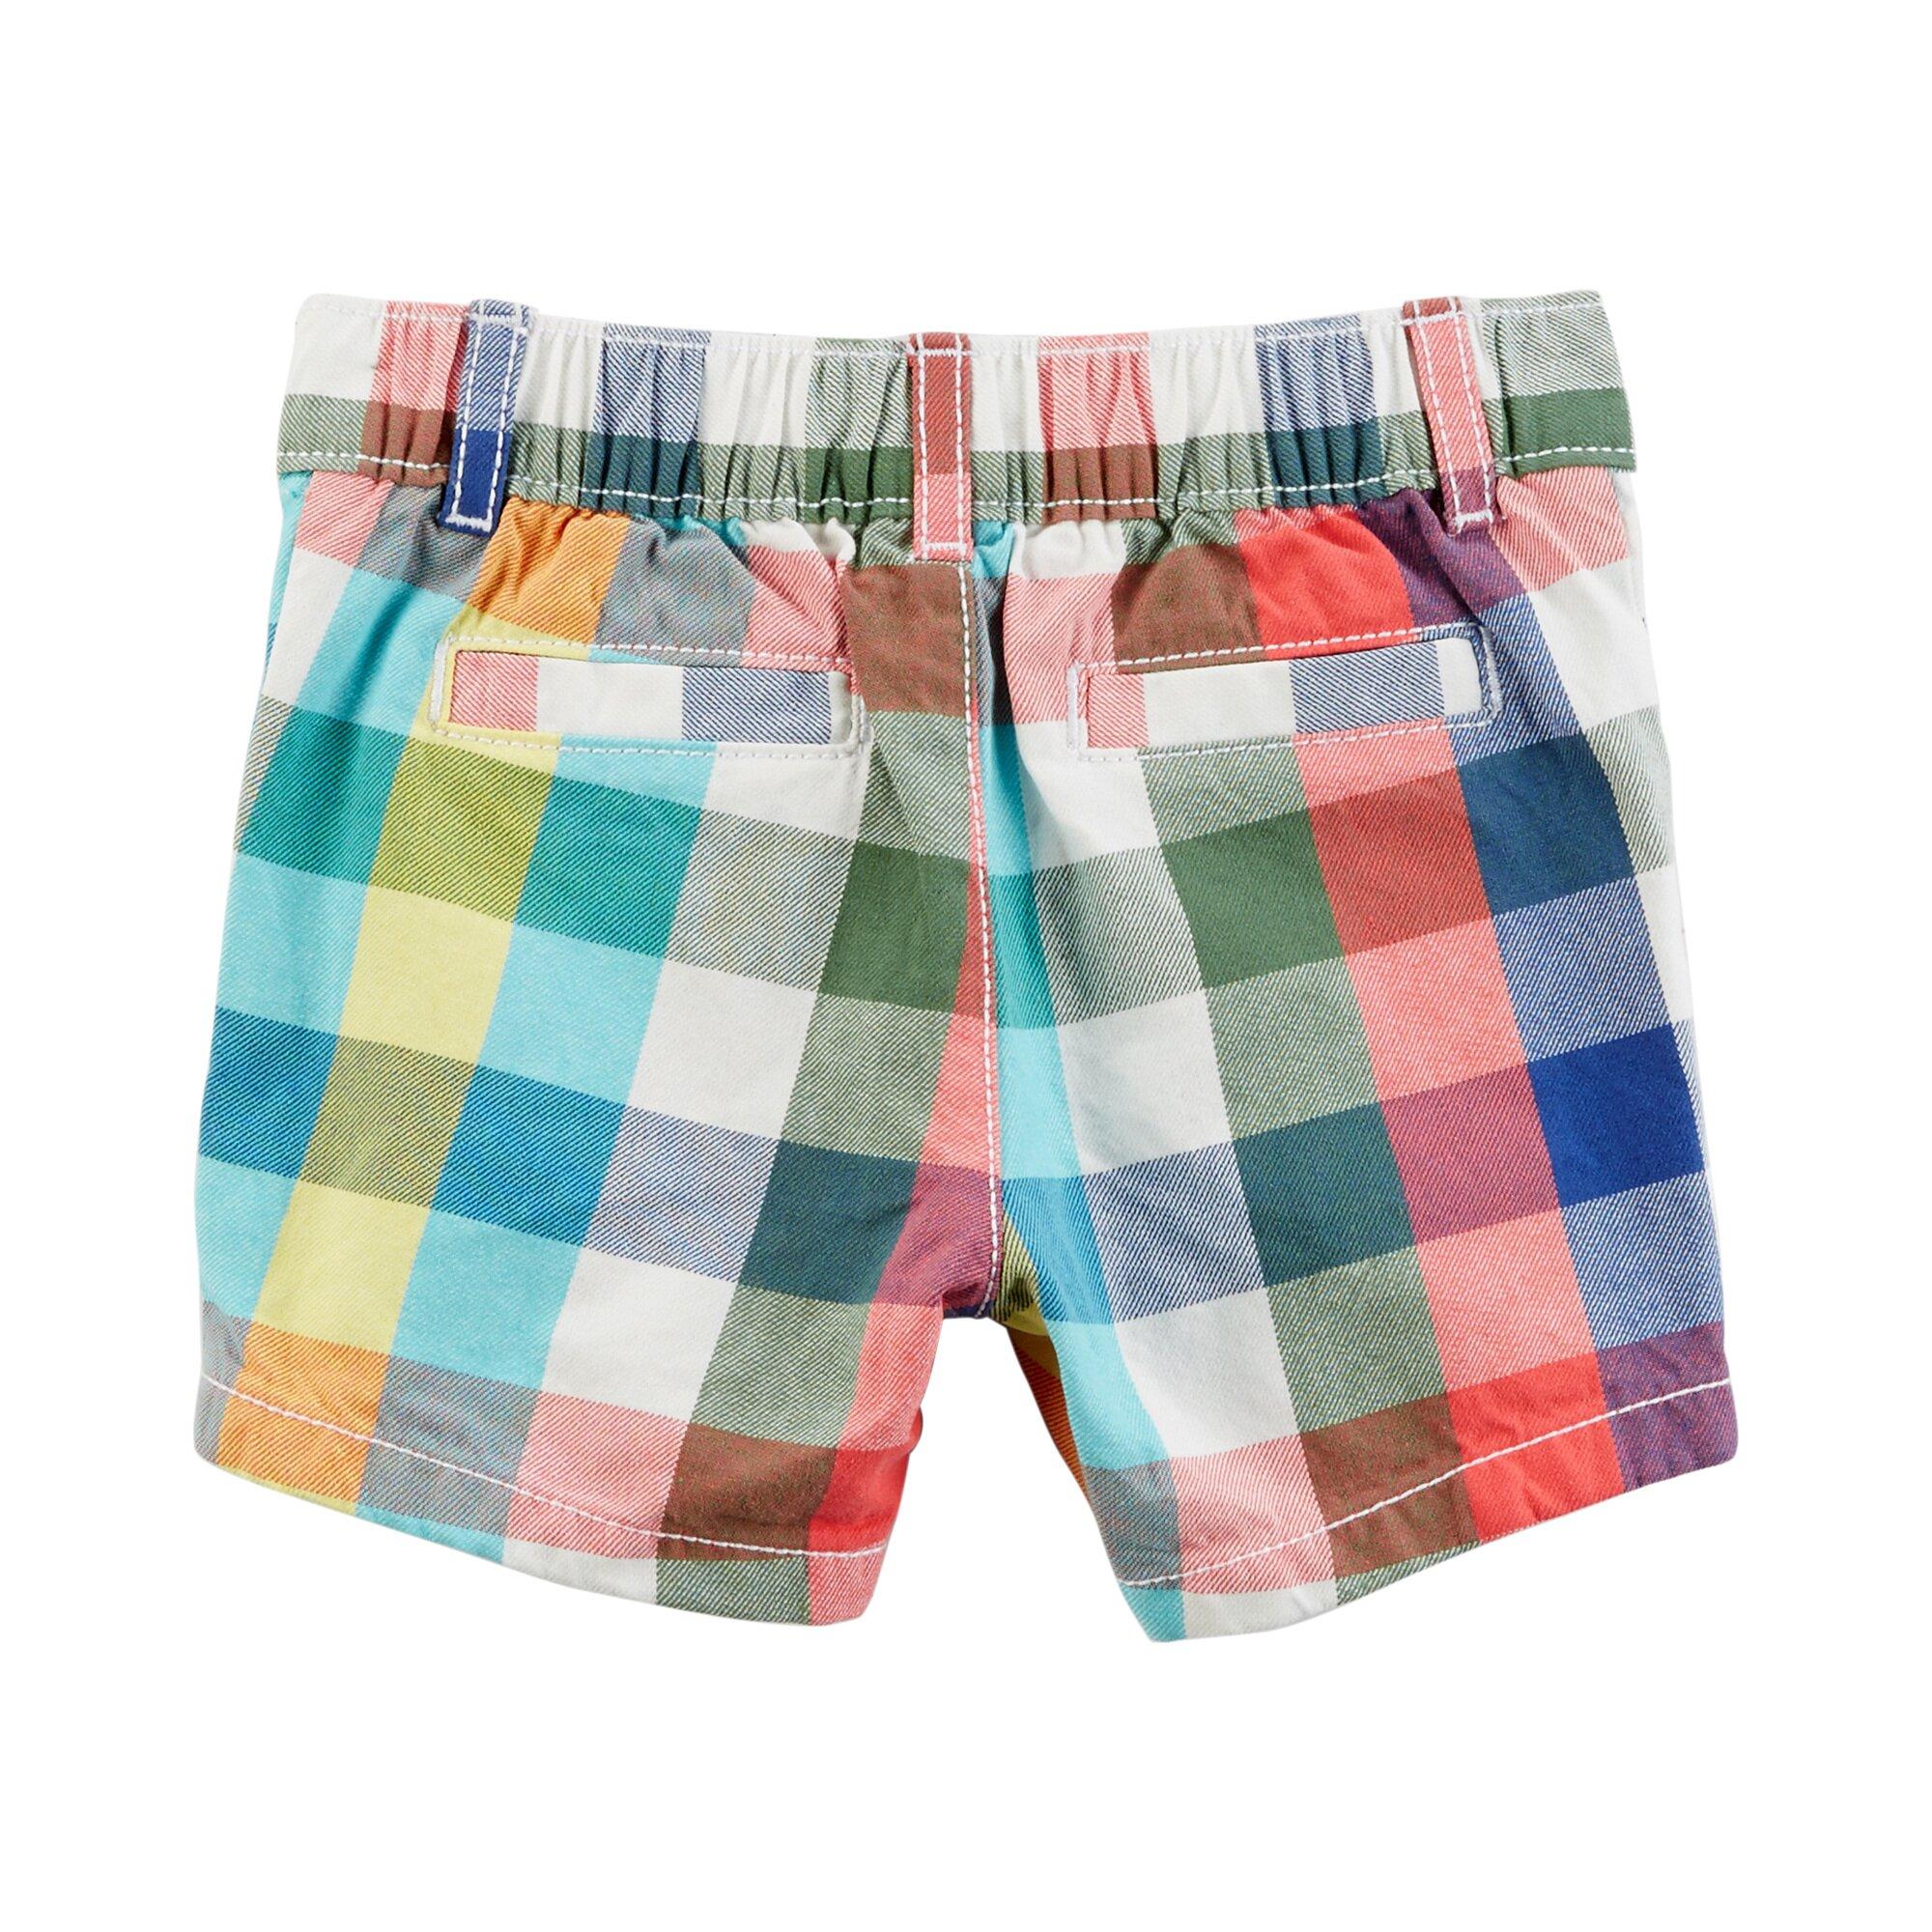 carter-s-2-tlg-set-jeans-hemd-kurzarm-und-shorts-karo